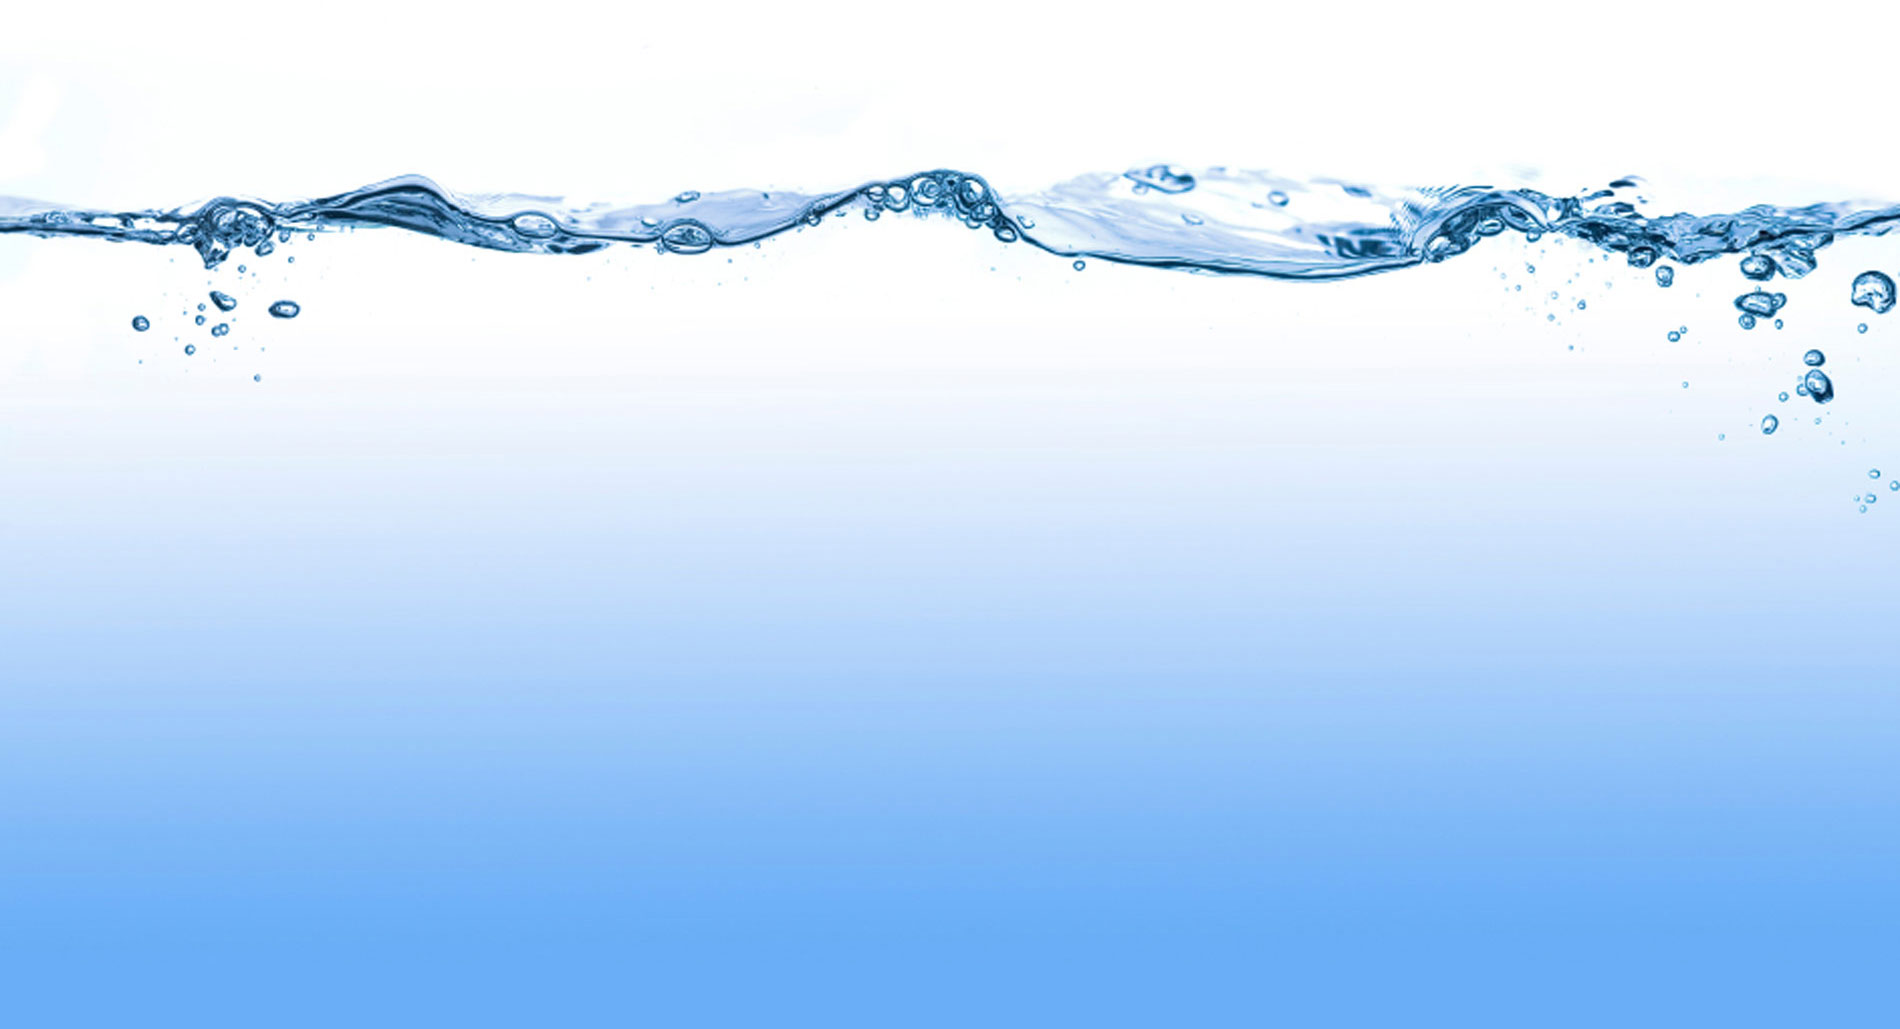 water drop wallpaper hd image